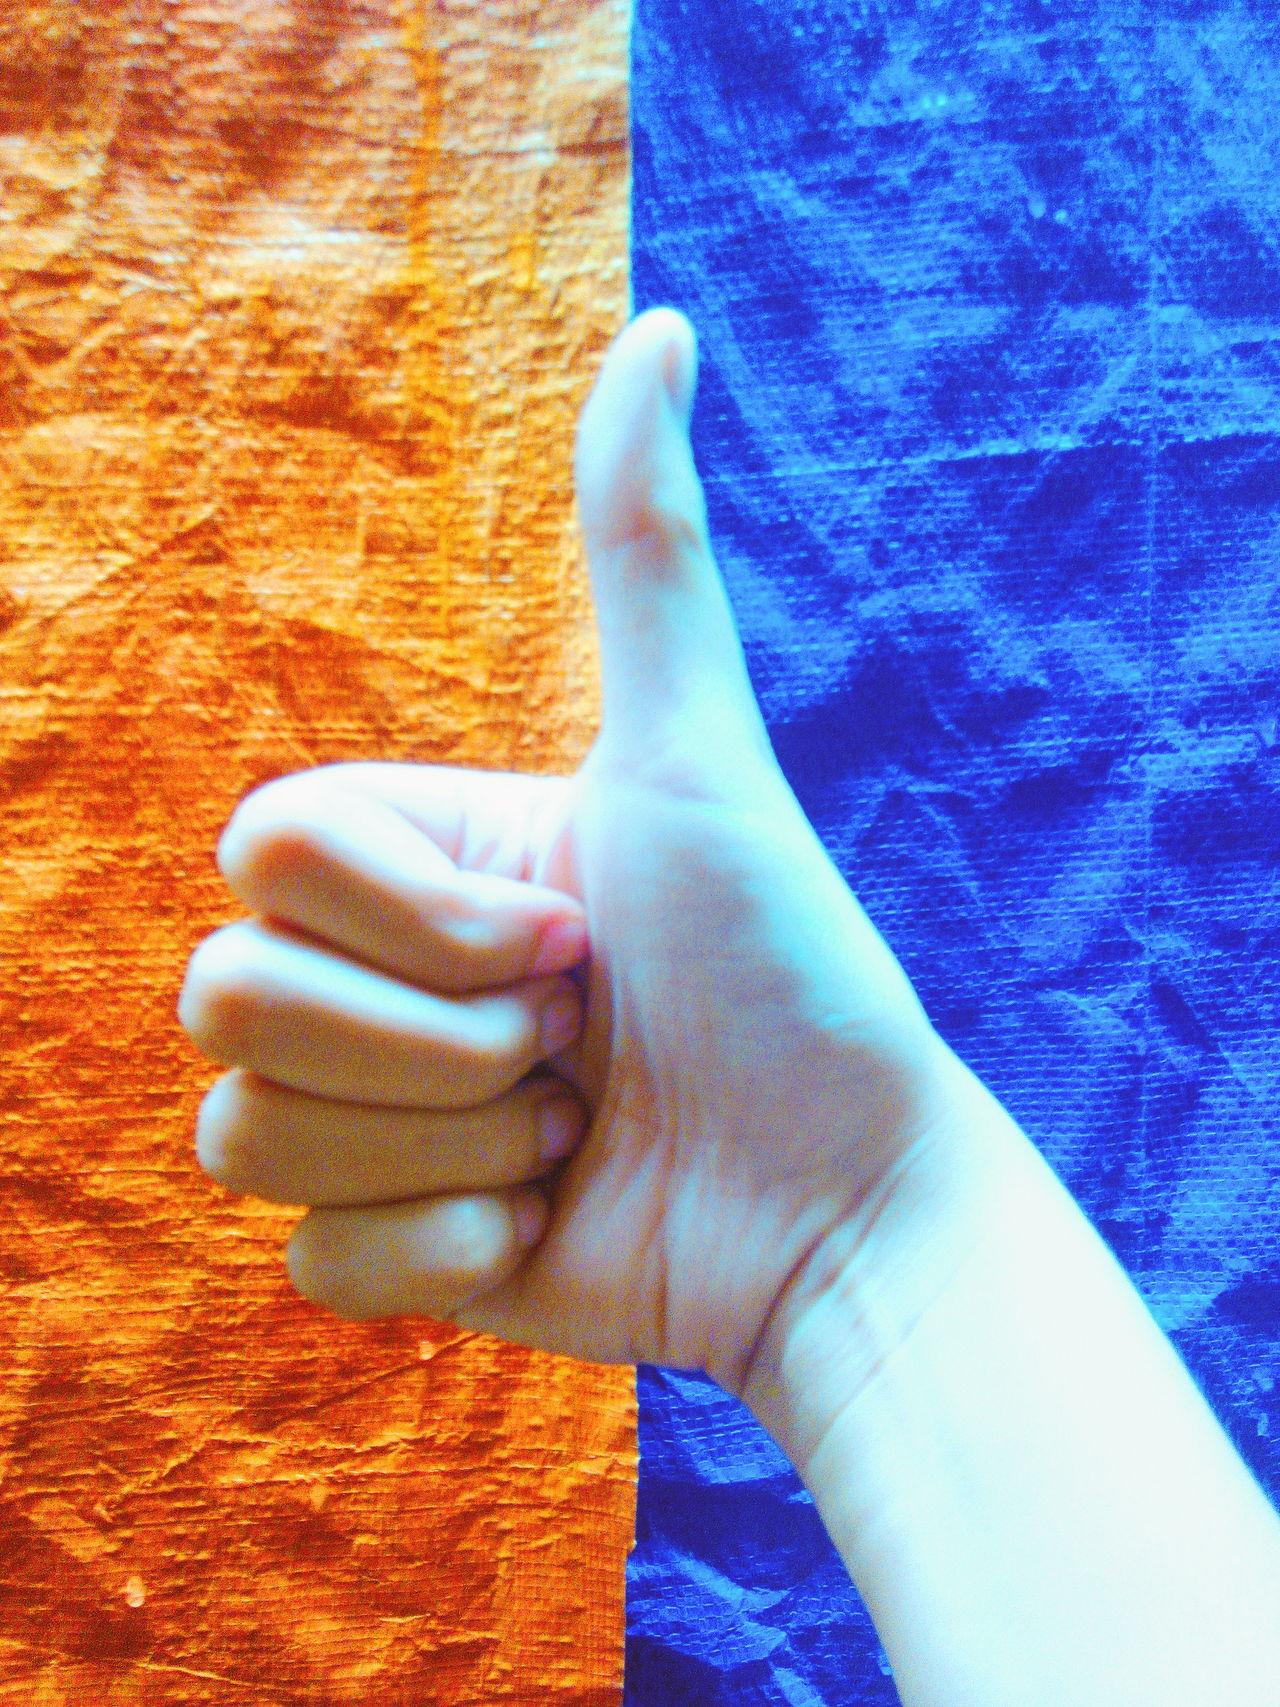 Orangeandblue Thumbsup Middle